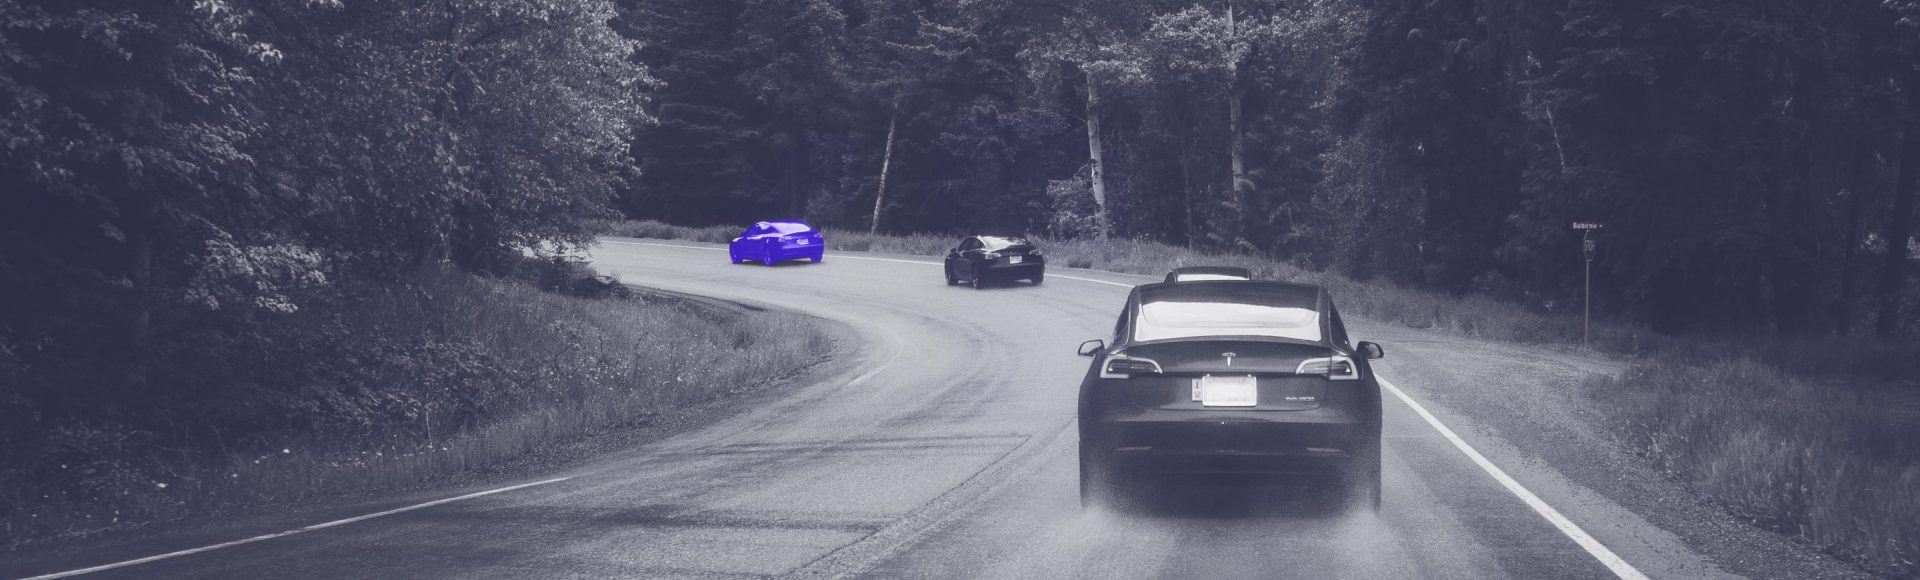 ARK-Invest_Blog-Banner_2020_09_18---Tesla-Uber-Lyft